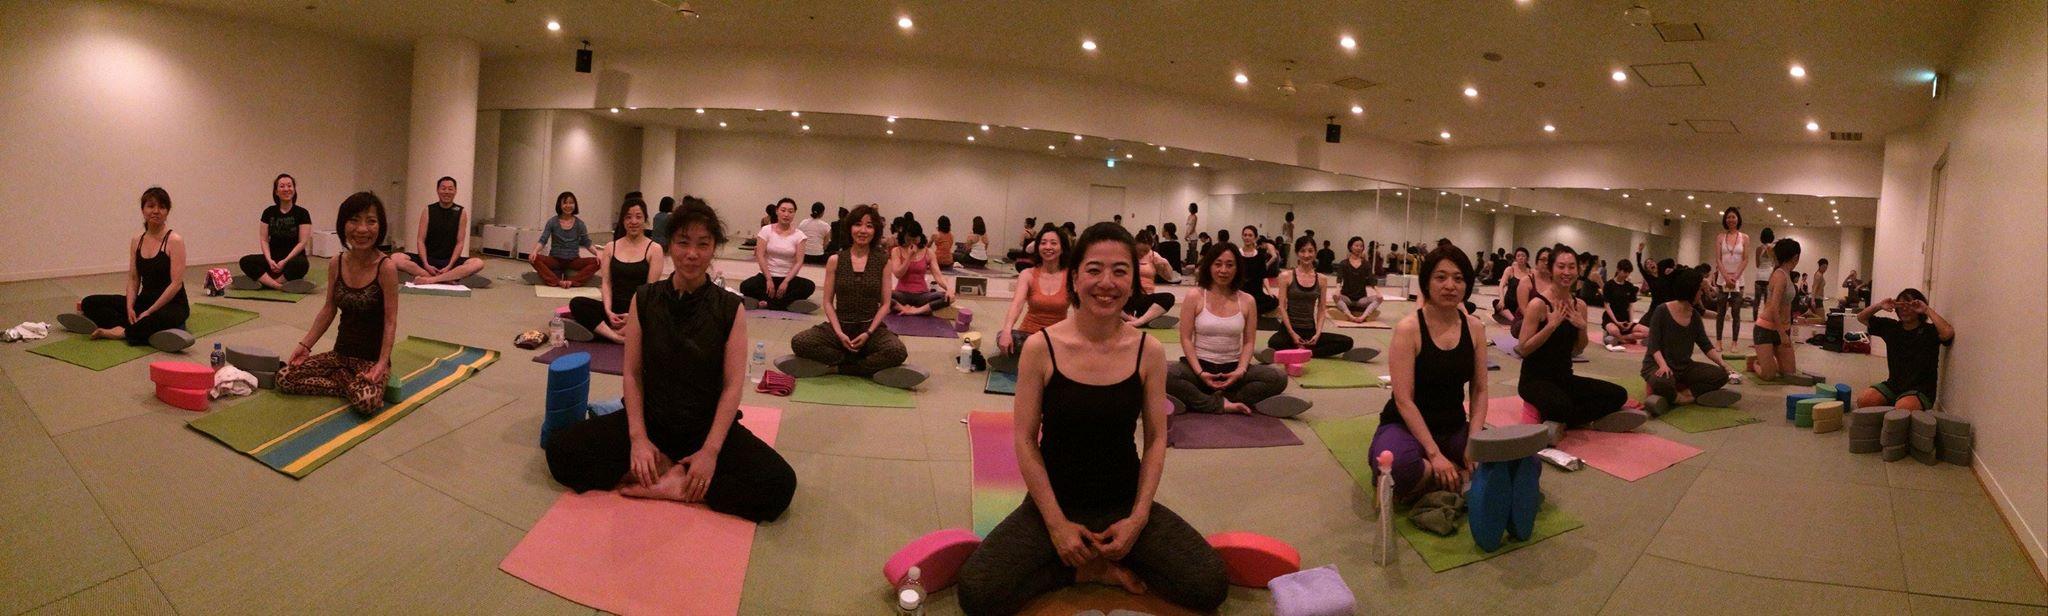 Yoga Teacher Training With Three Minute Egg